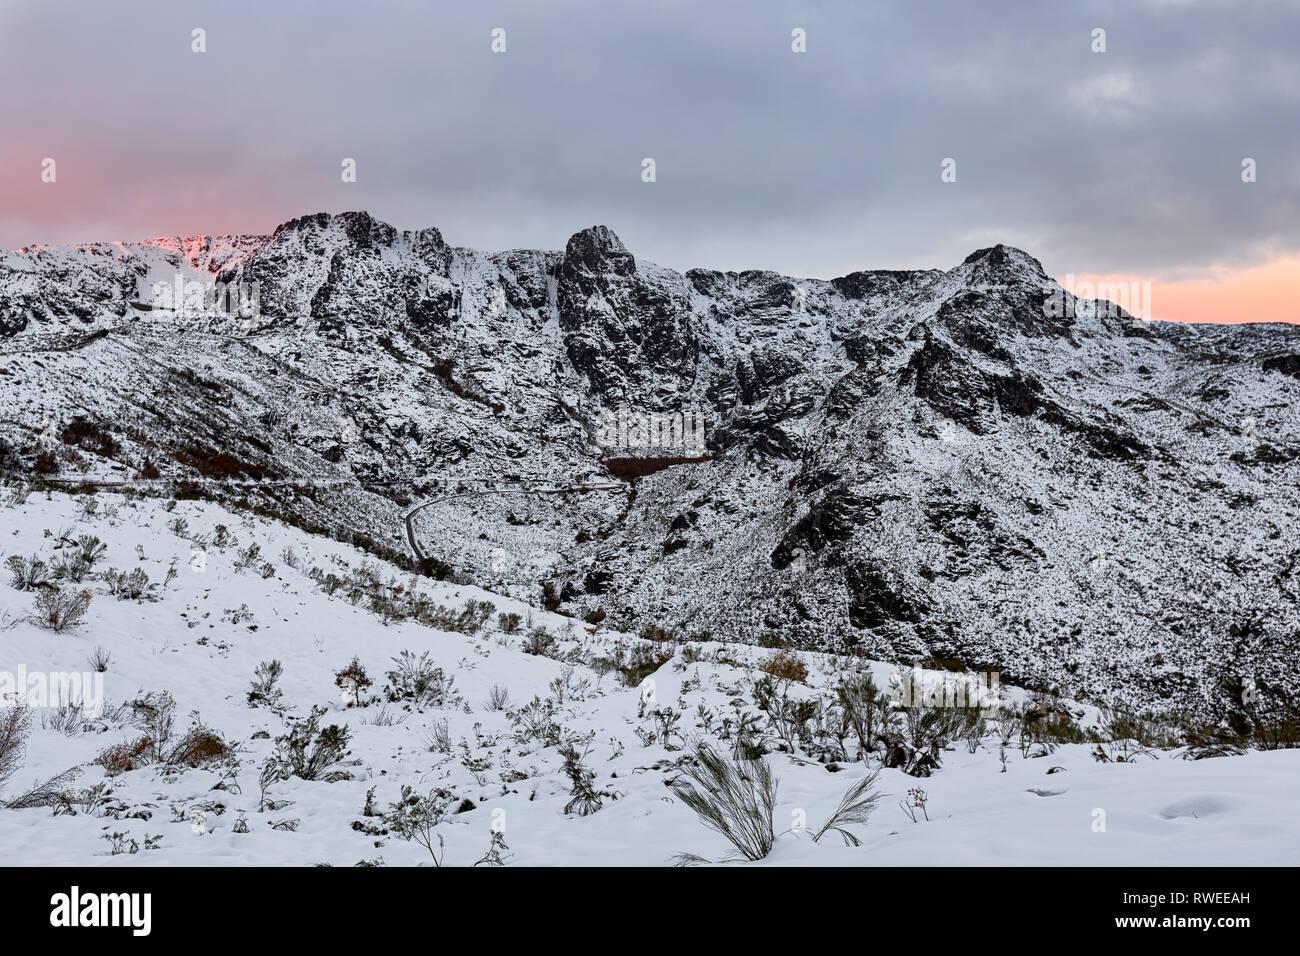 La Serra da Estrela, Cântaros e Covão d'Ametade, Portogallo Immagini Stock